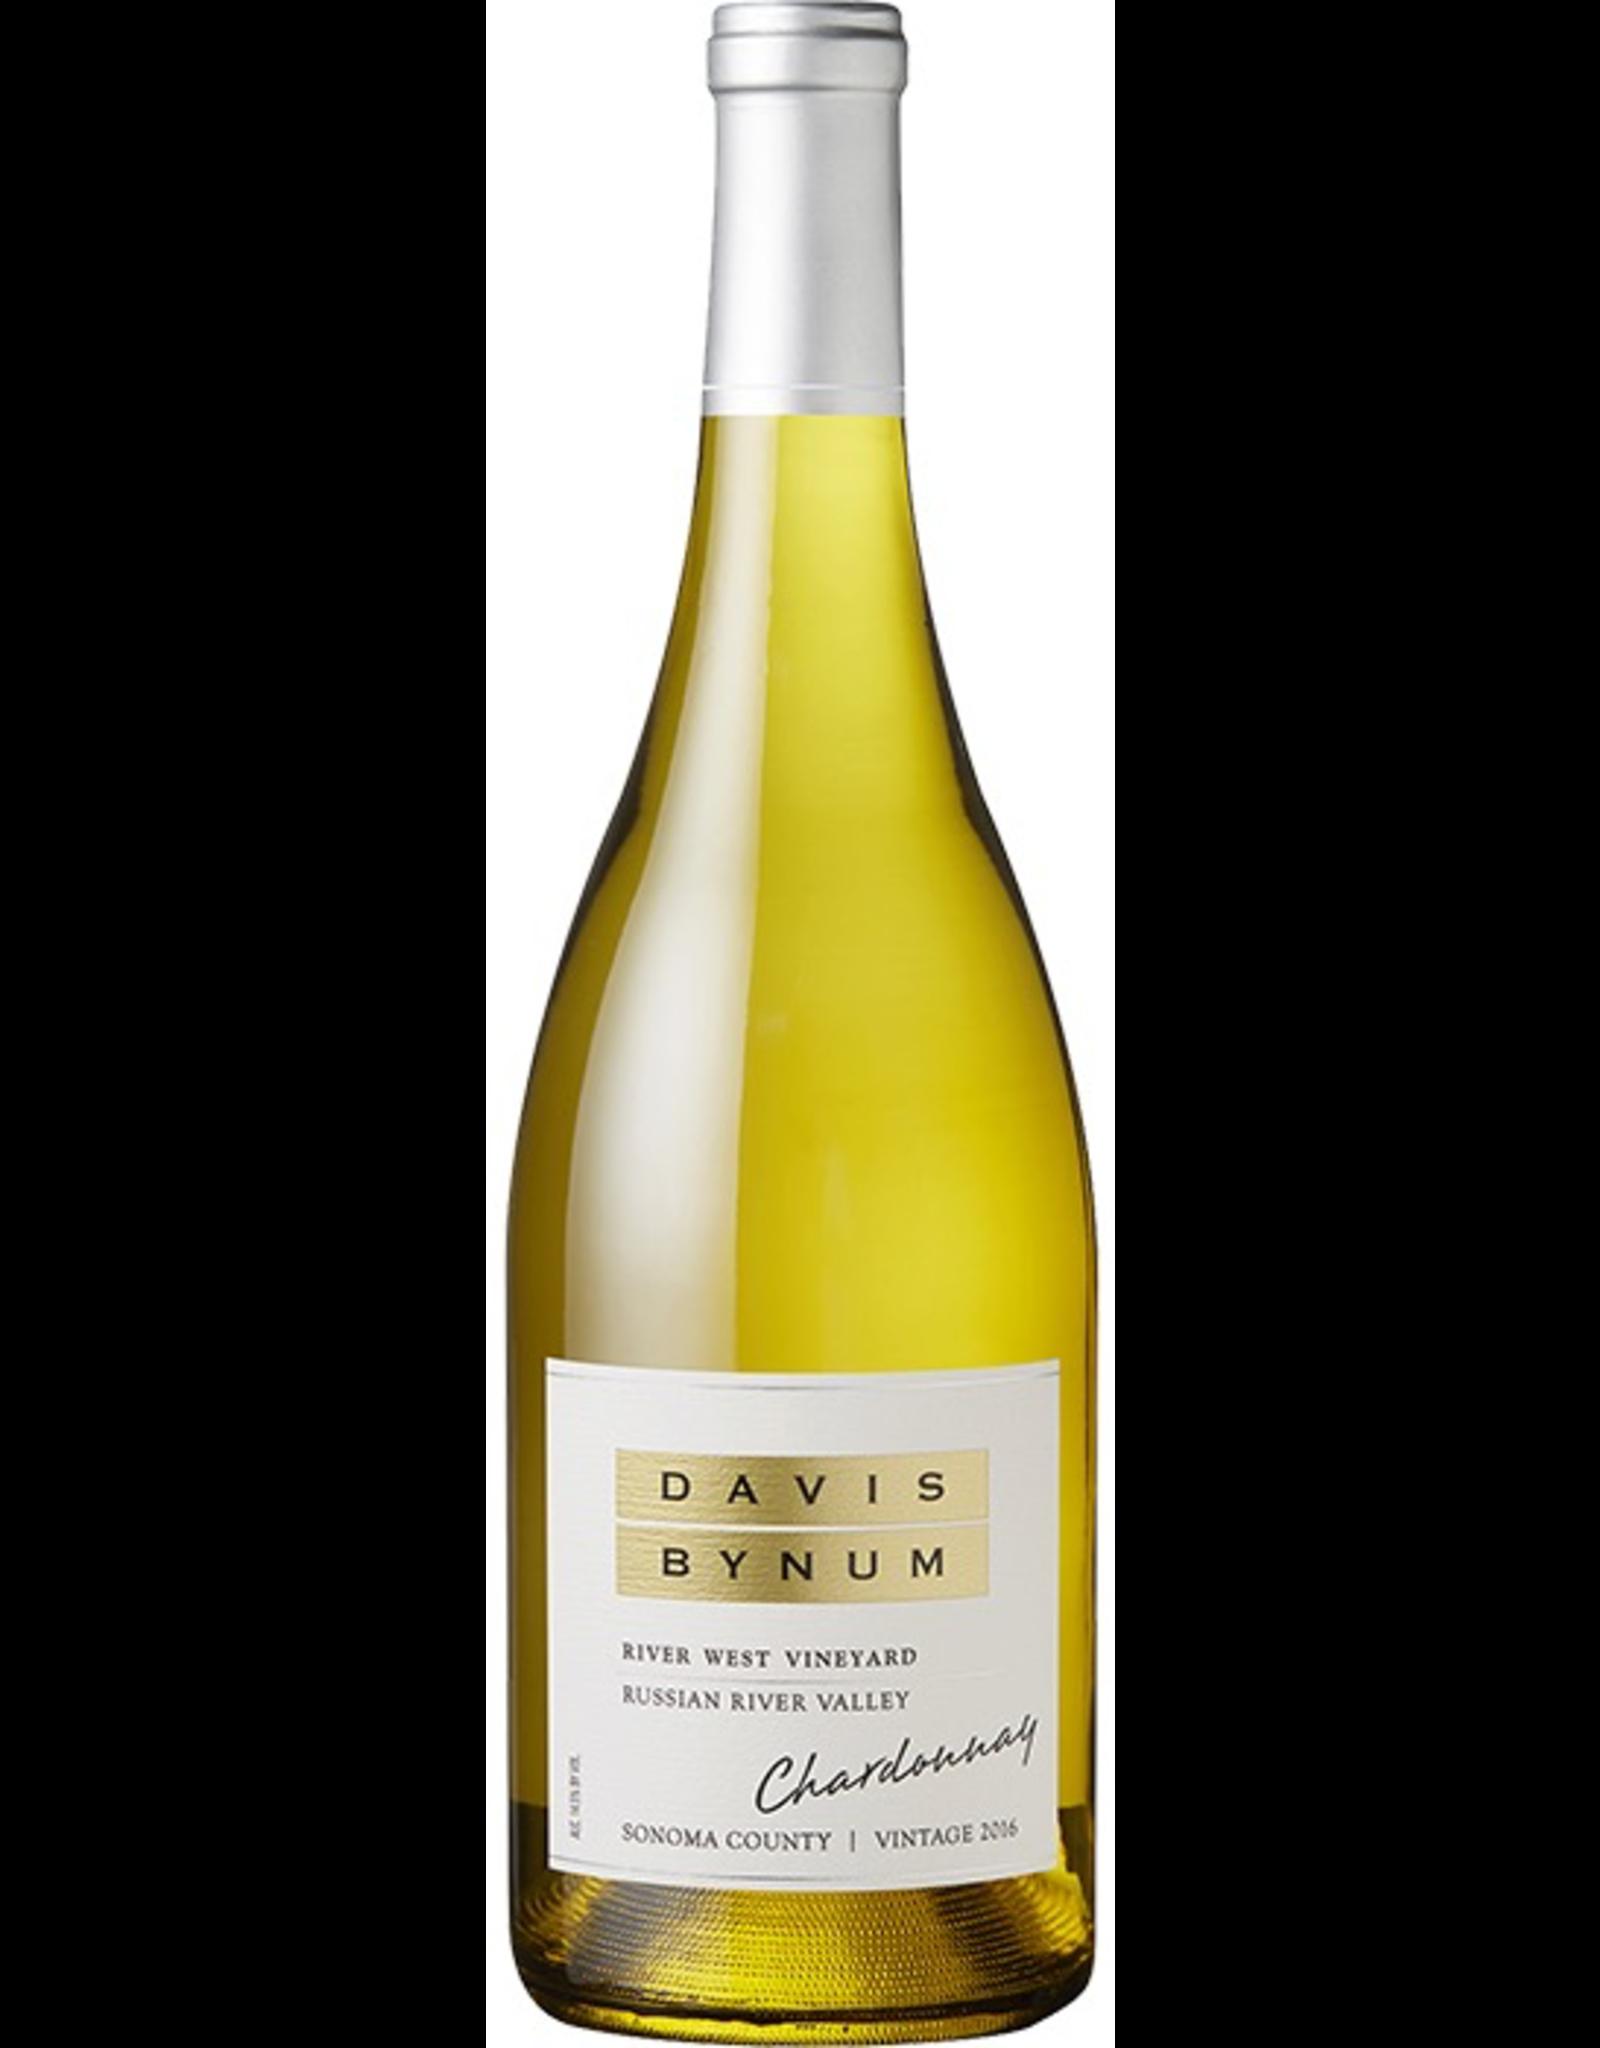 White Wine 2016, Davis Bynum River West Vineyard, Chardonnay, Russian River, Sonoma, California, USA, 14.5% Alc, CT